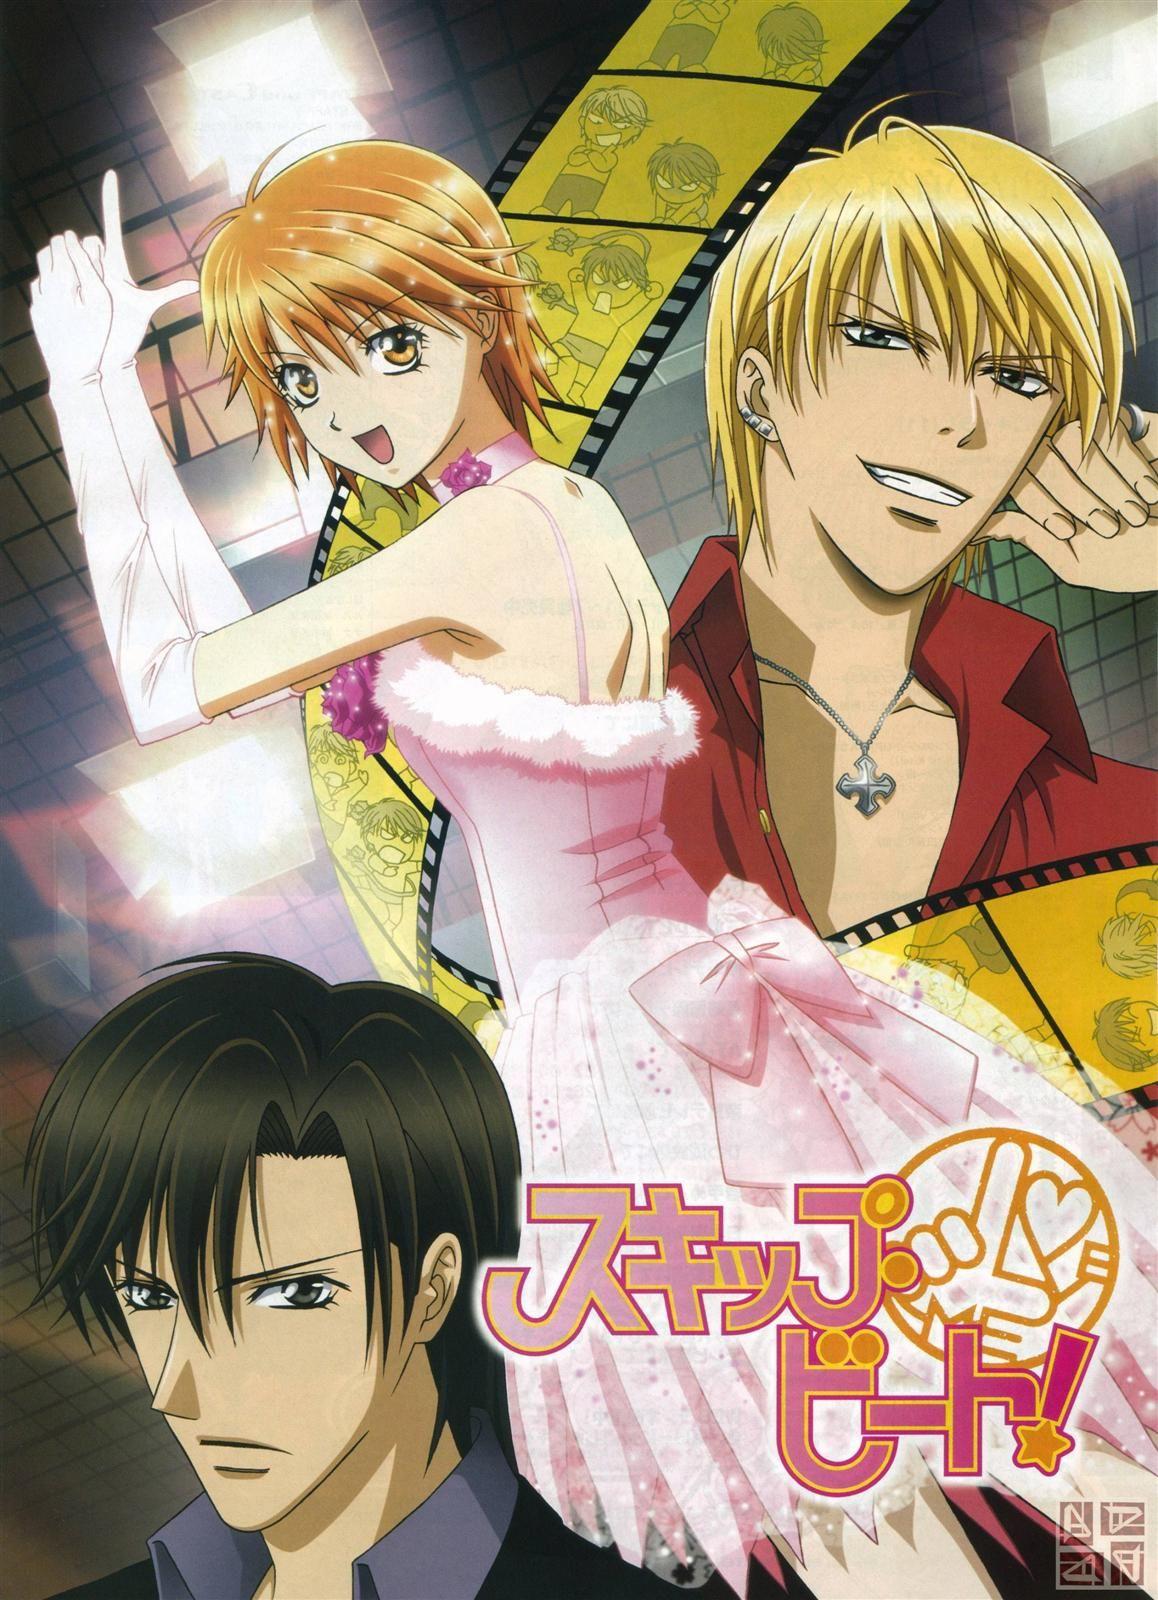 best dubbed romance anime on crunchyroll